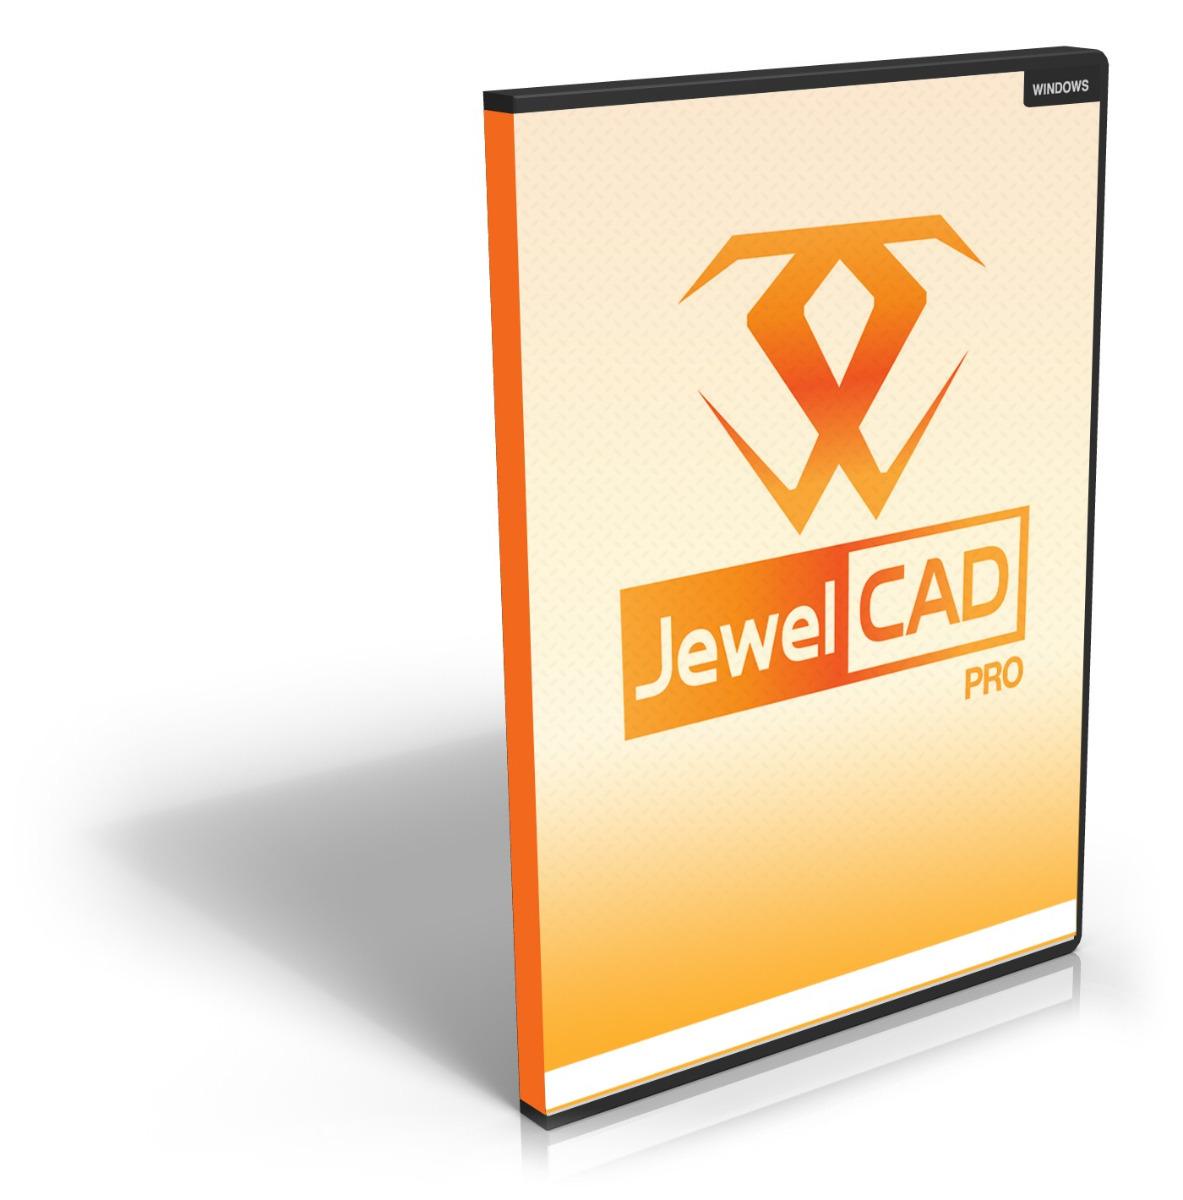 JewelCAD Pro